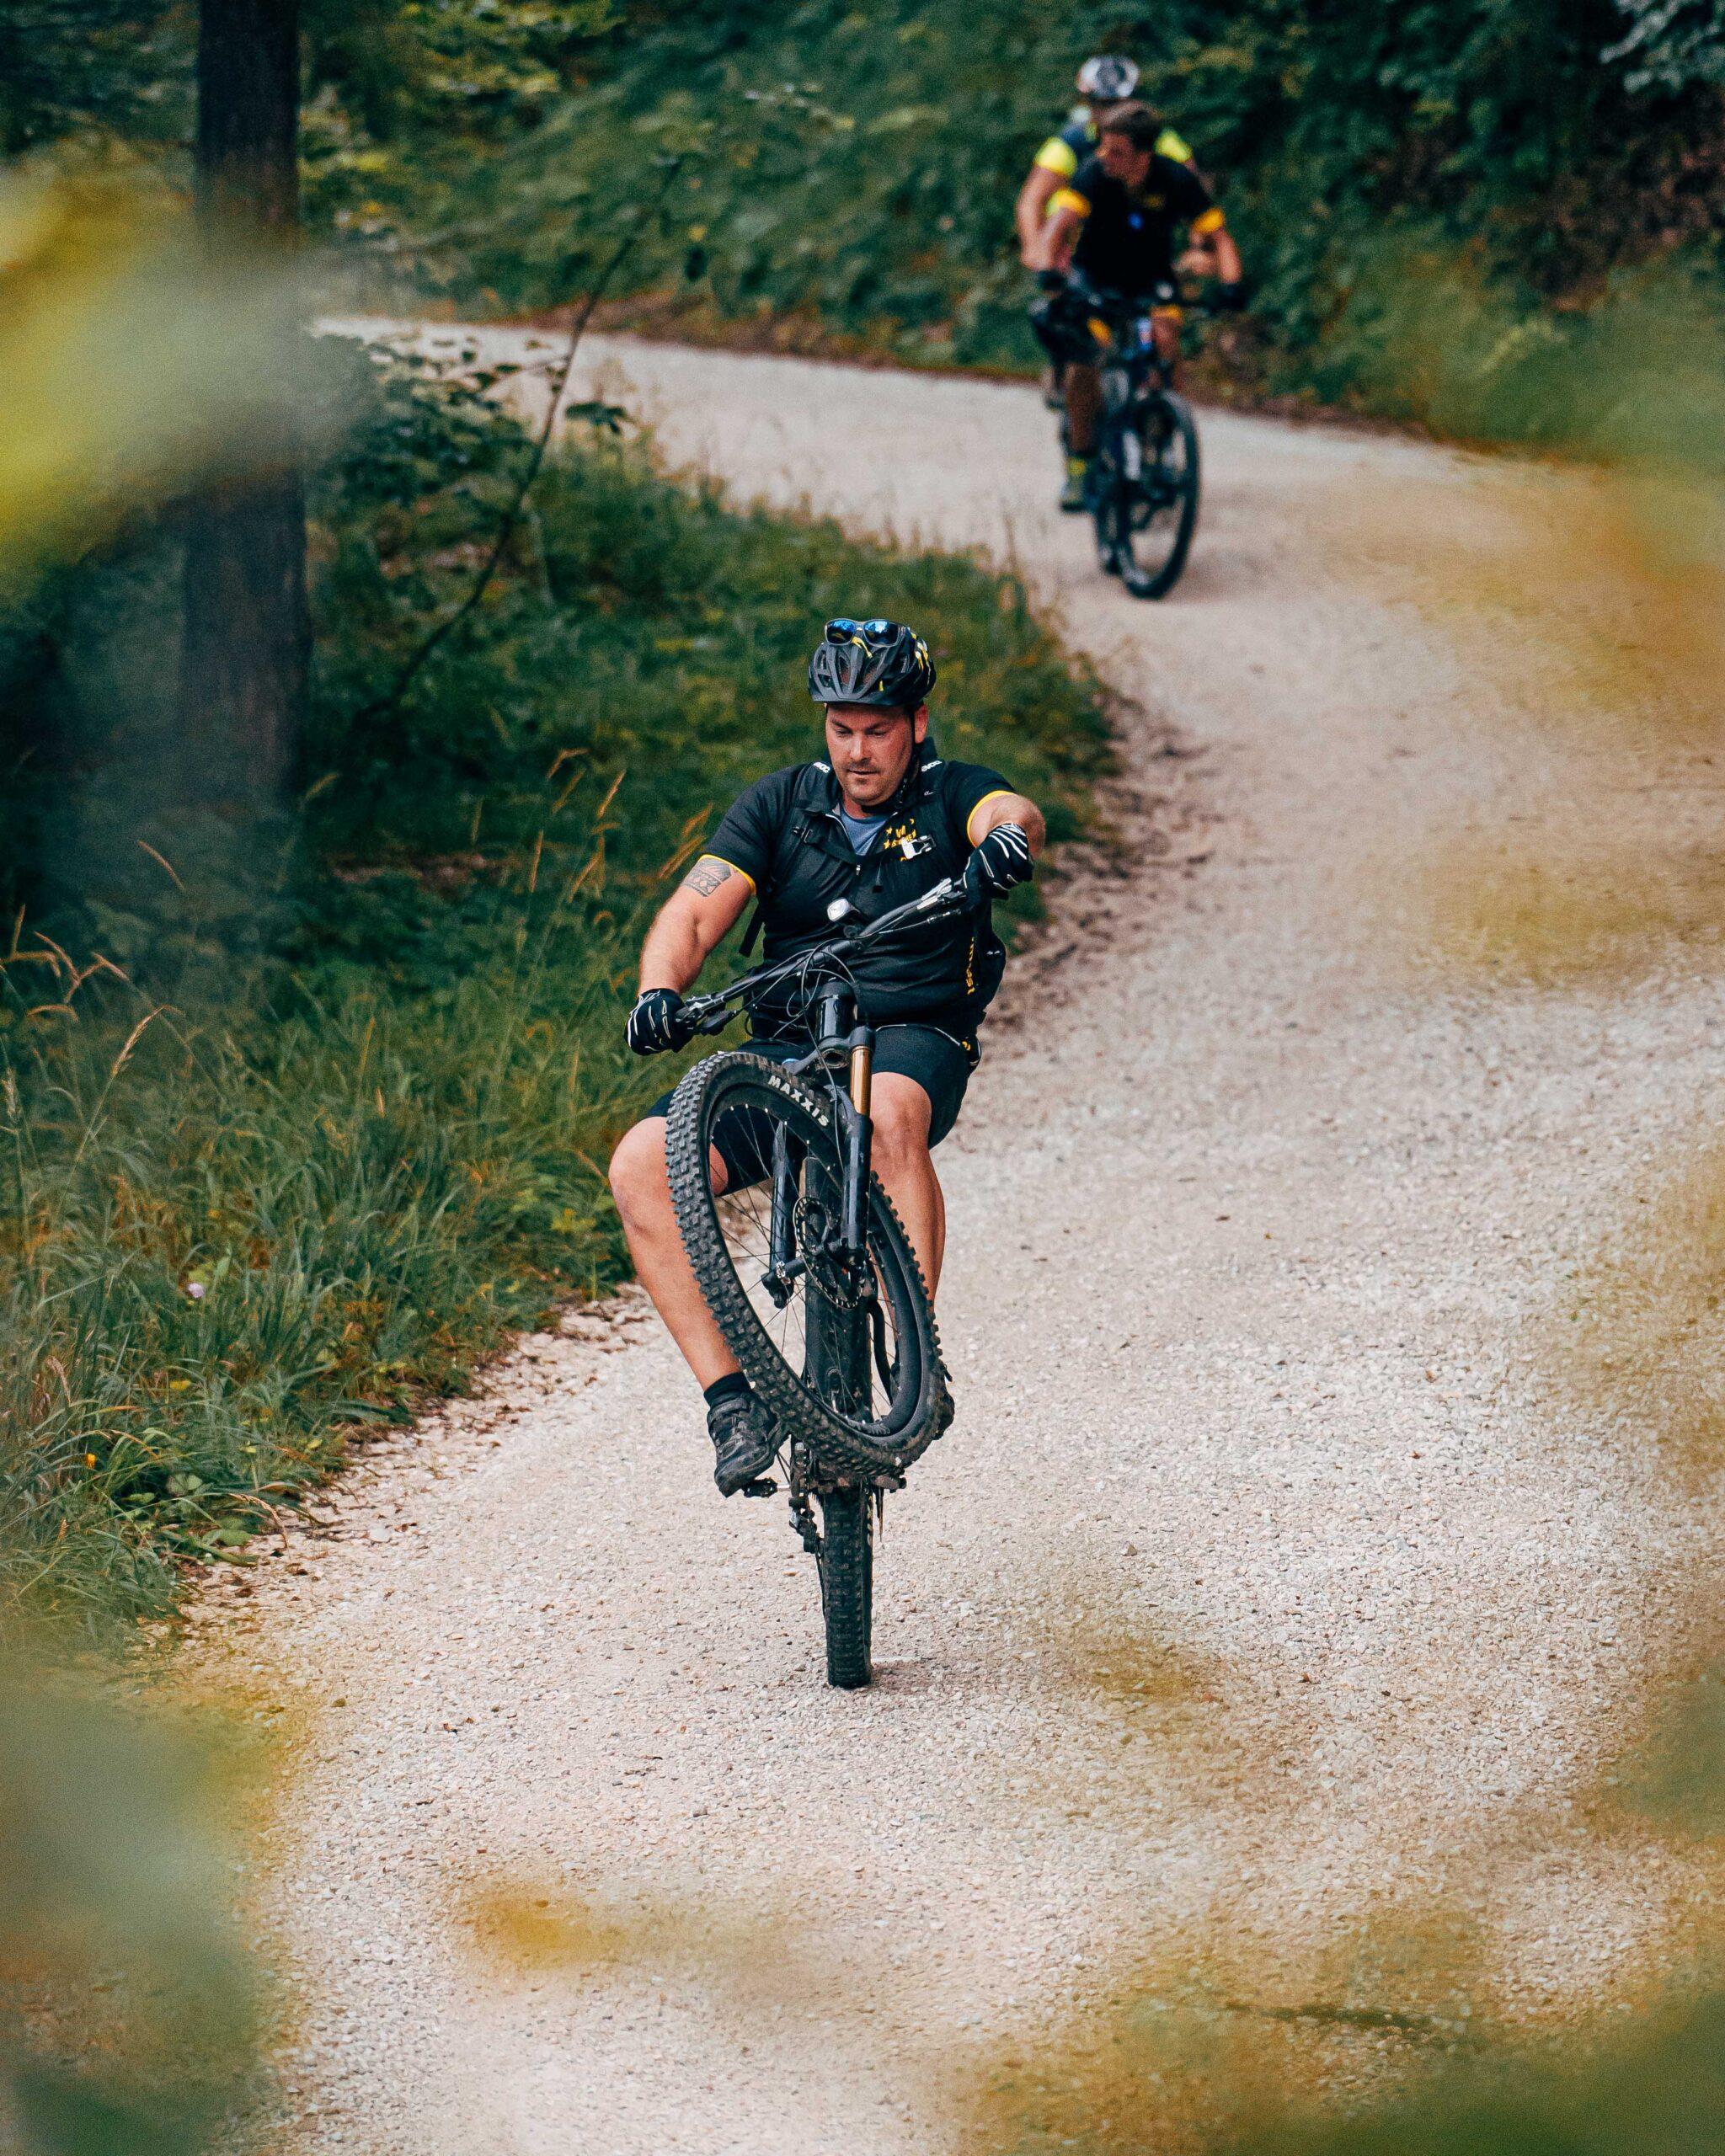 Thumsee_Wheelie_mountainbike_salzbike_homeofcontent